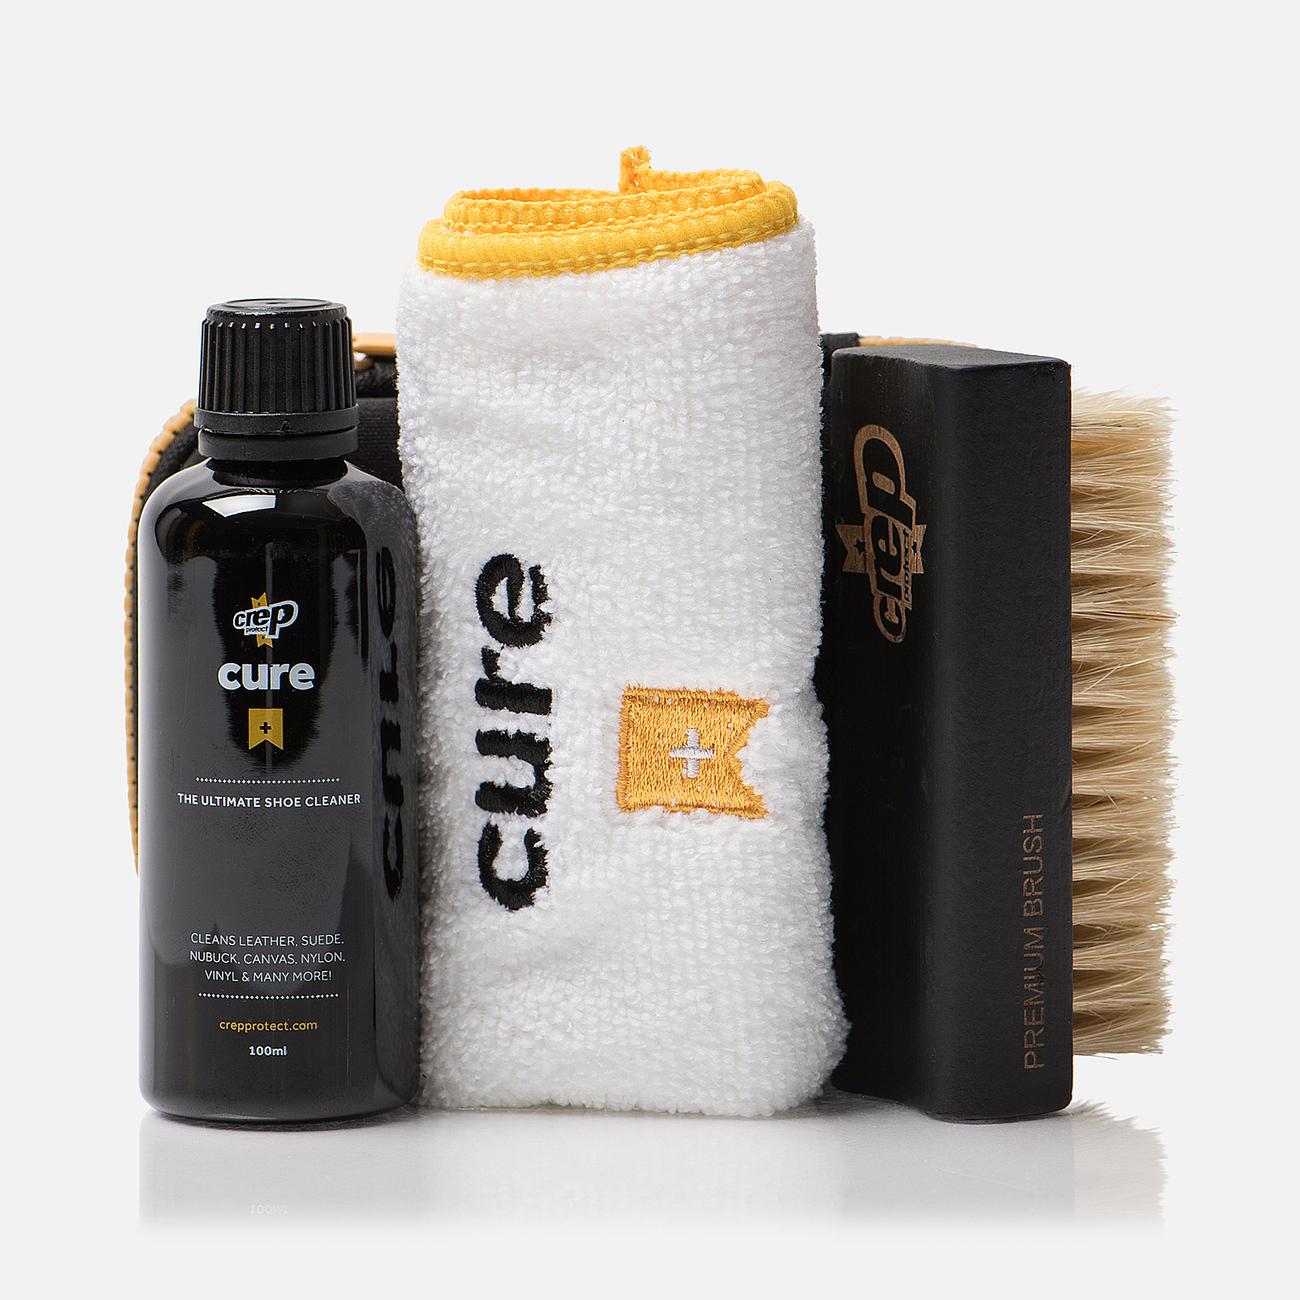 Набор для ухода за обувью Crep Protect Cure Sneaker Cleaning Kit